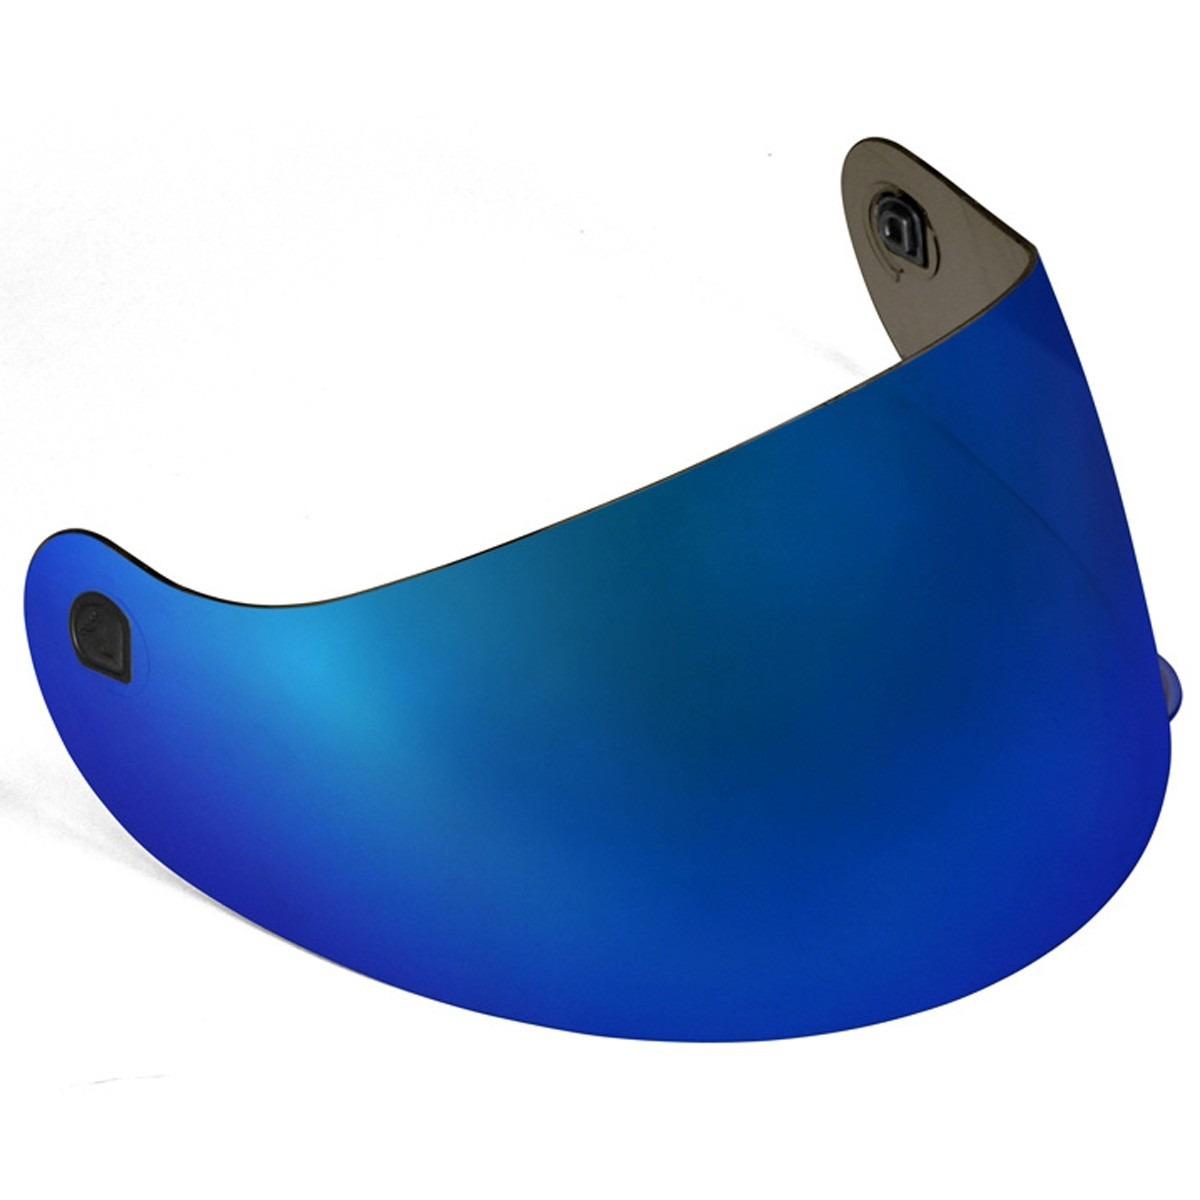 Viseira Azul Metalizada para Capacetes Peels Spike